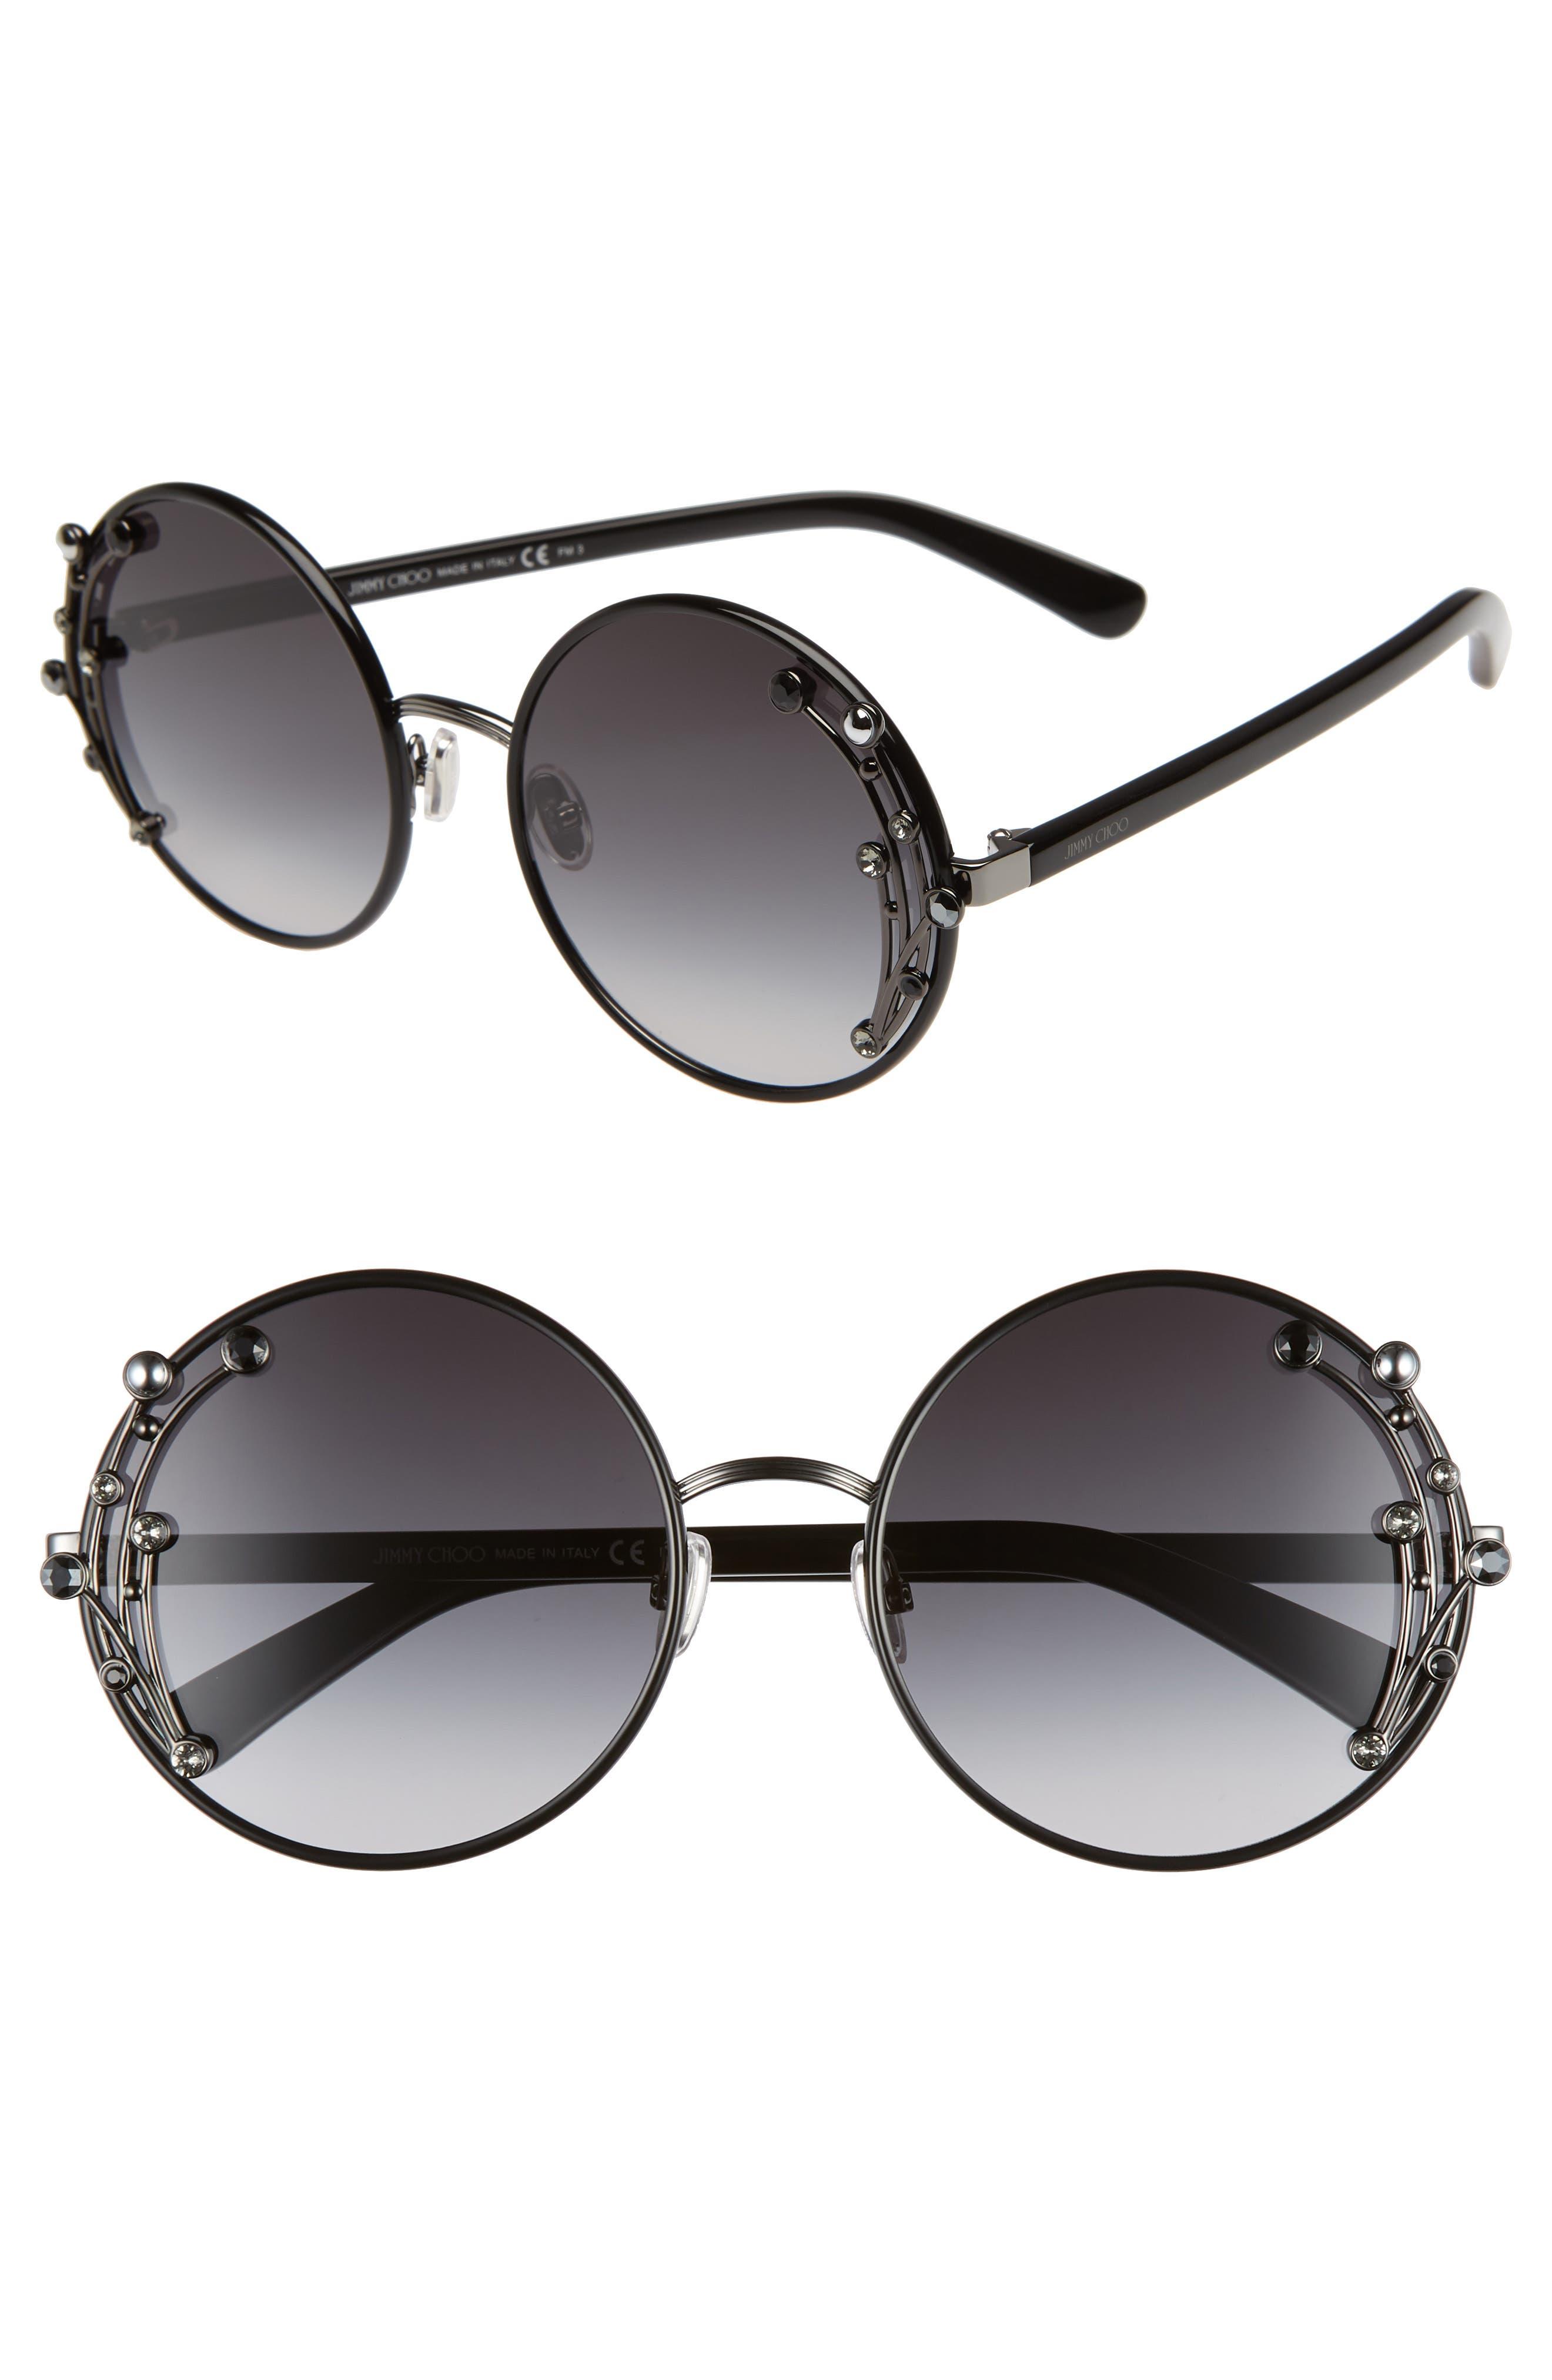 8ac141b2de Jimmy Choo Sunglasses for Women